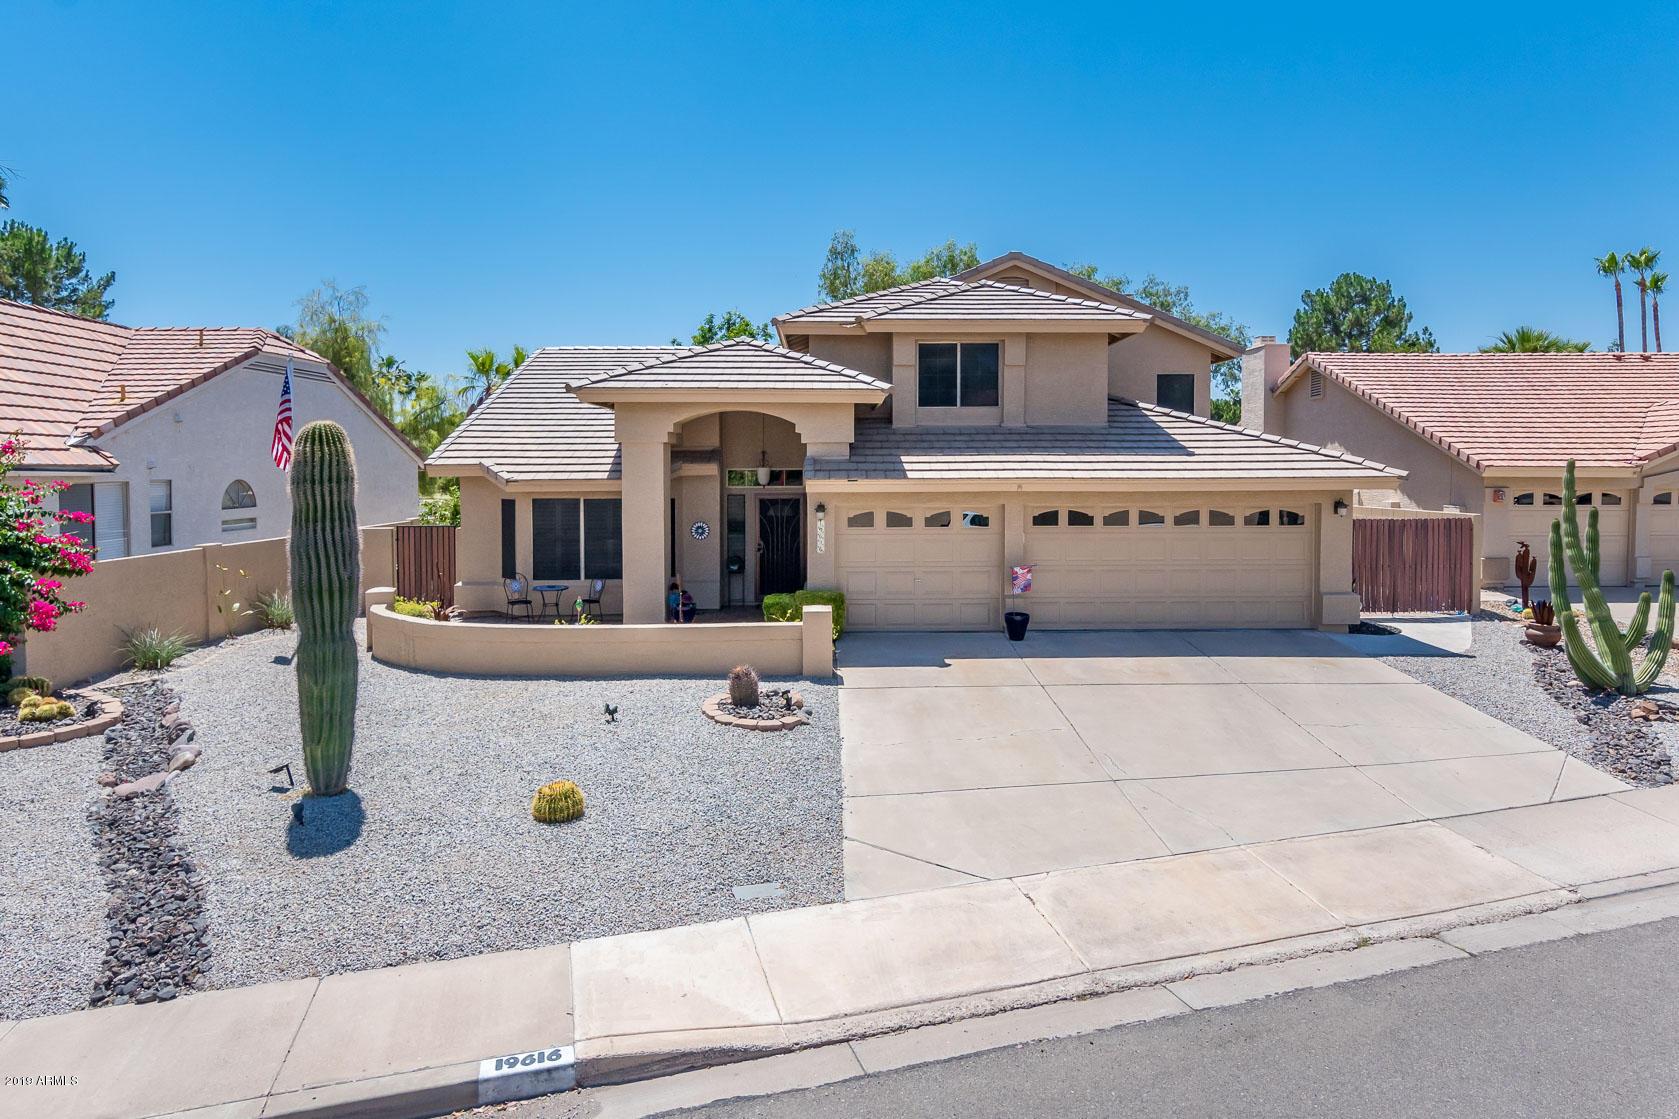 Photo of 19616 N 68TH Avenue, Glendale, AZ 85308